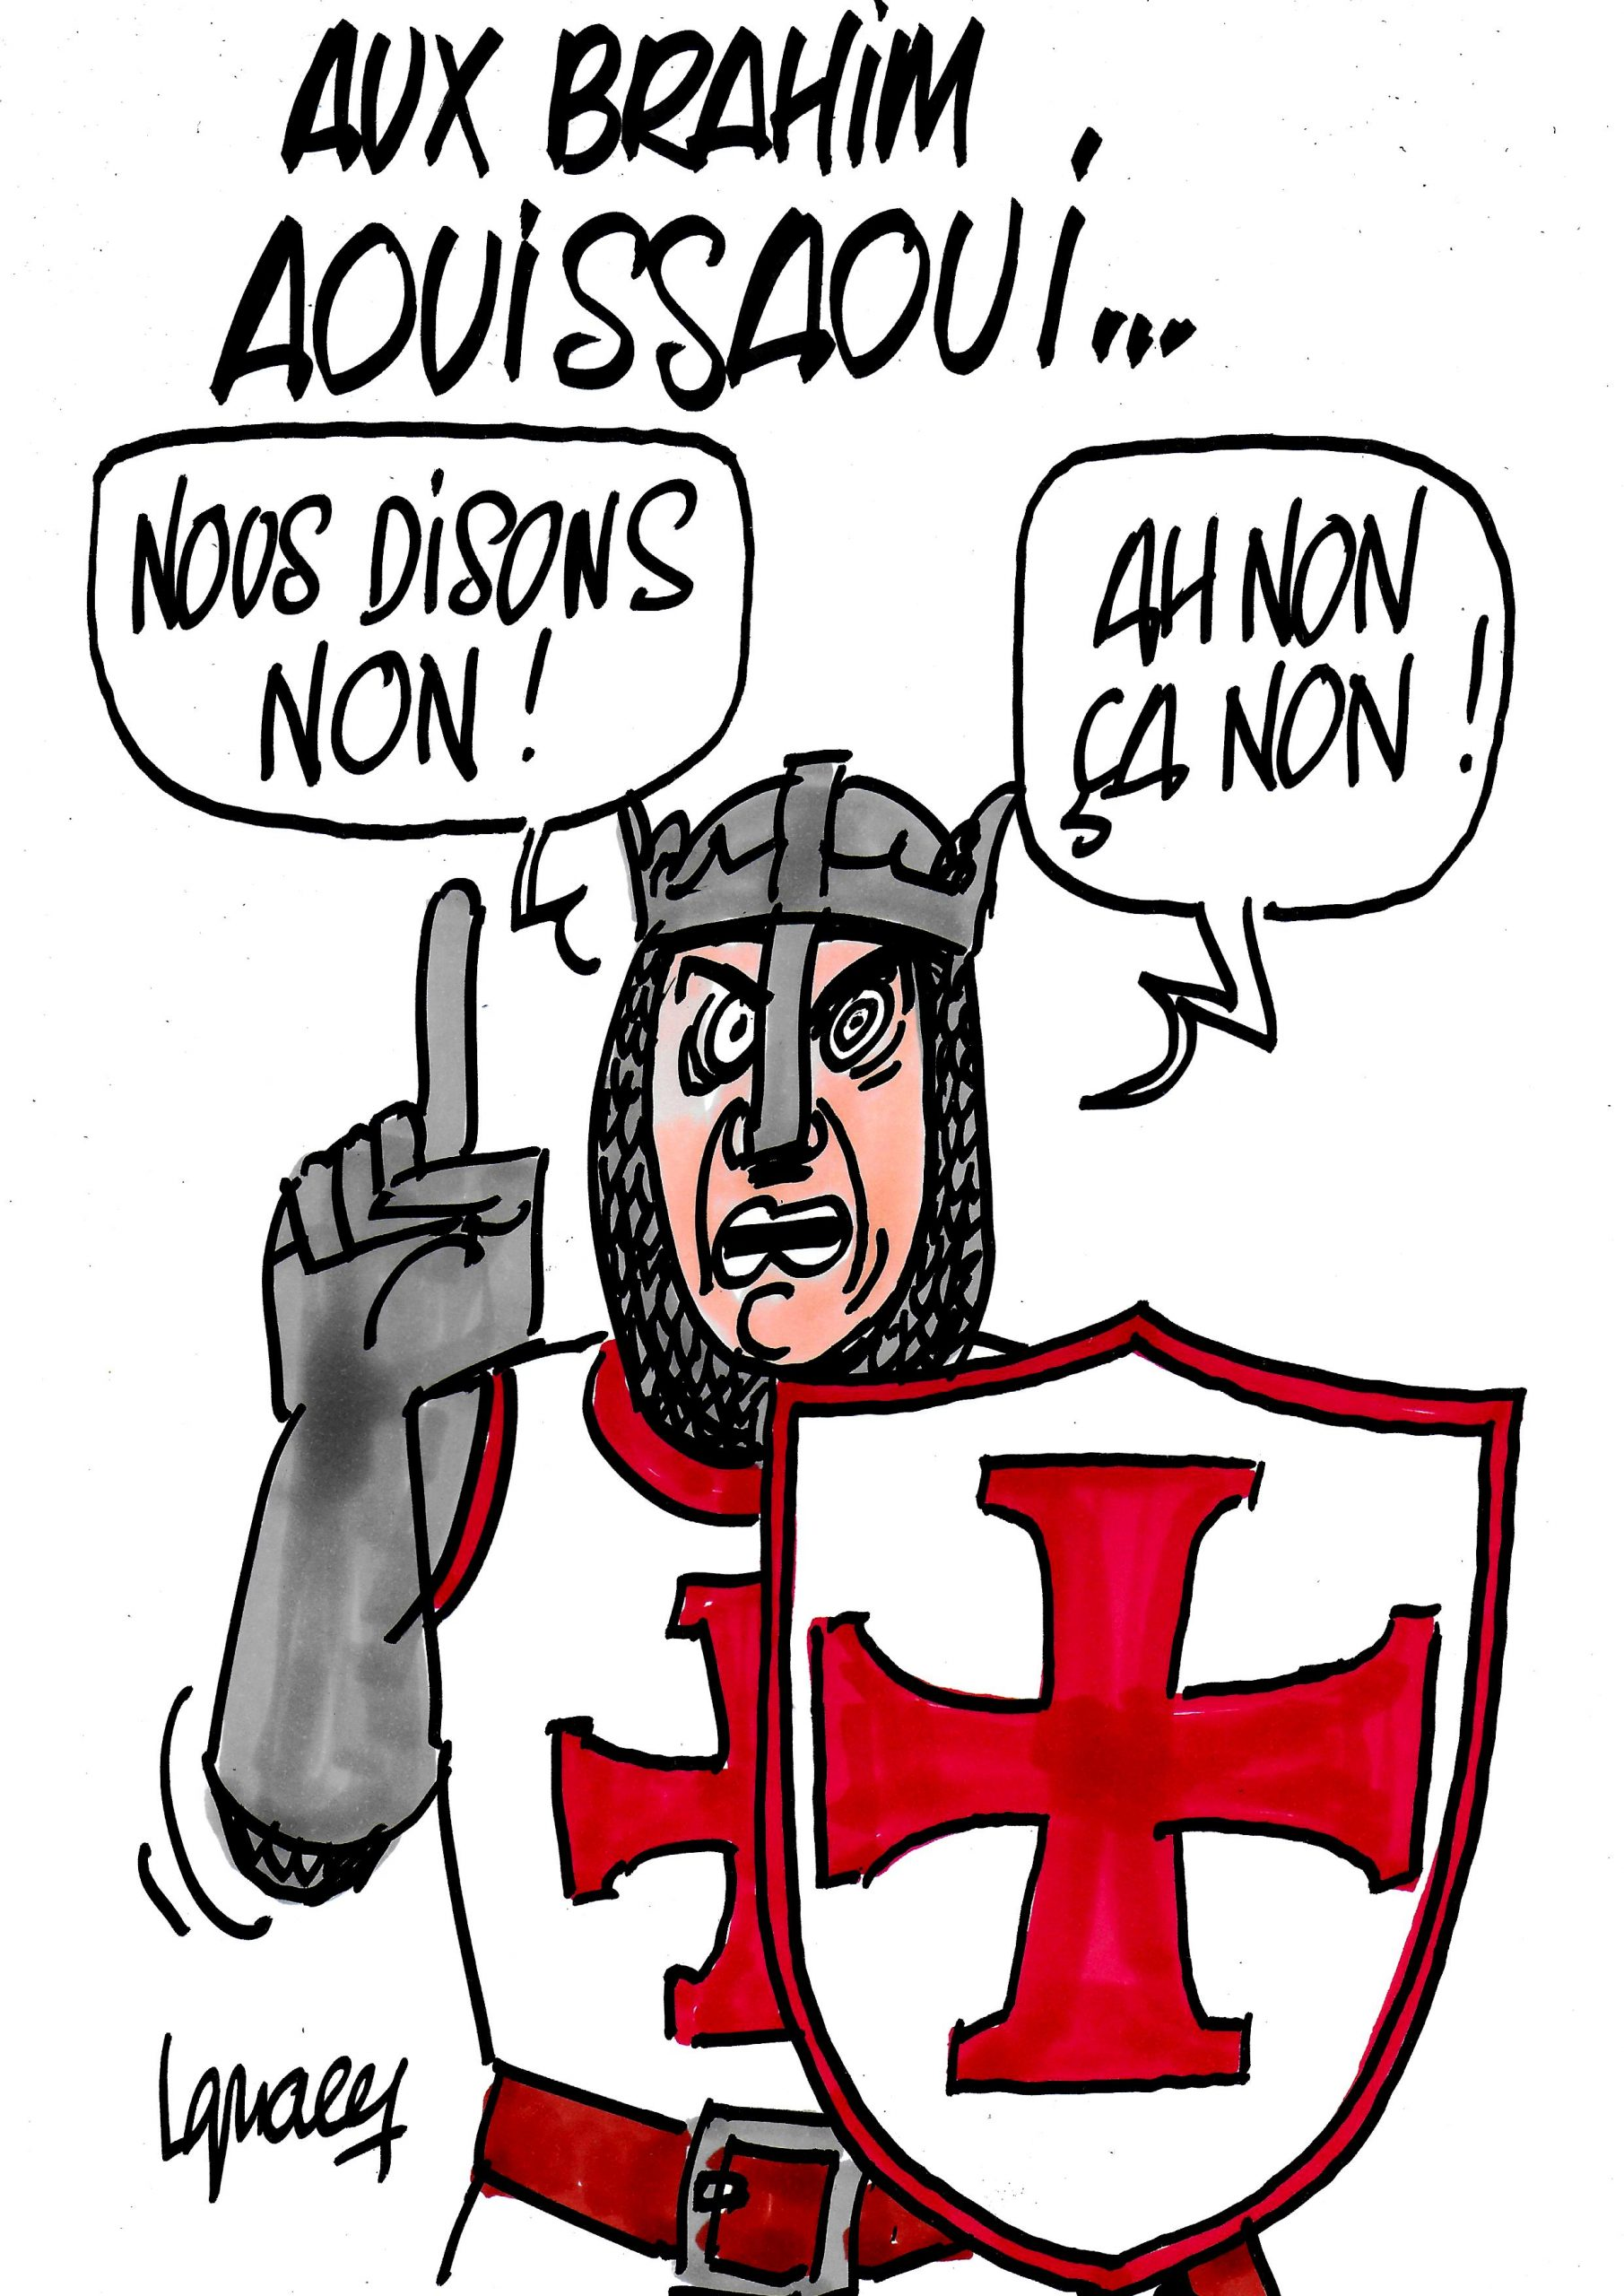 Ignace - Aux Brahim Aouissaoui...